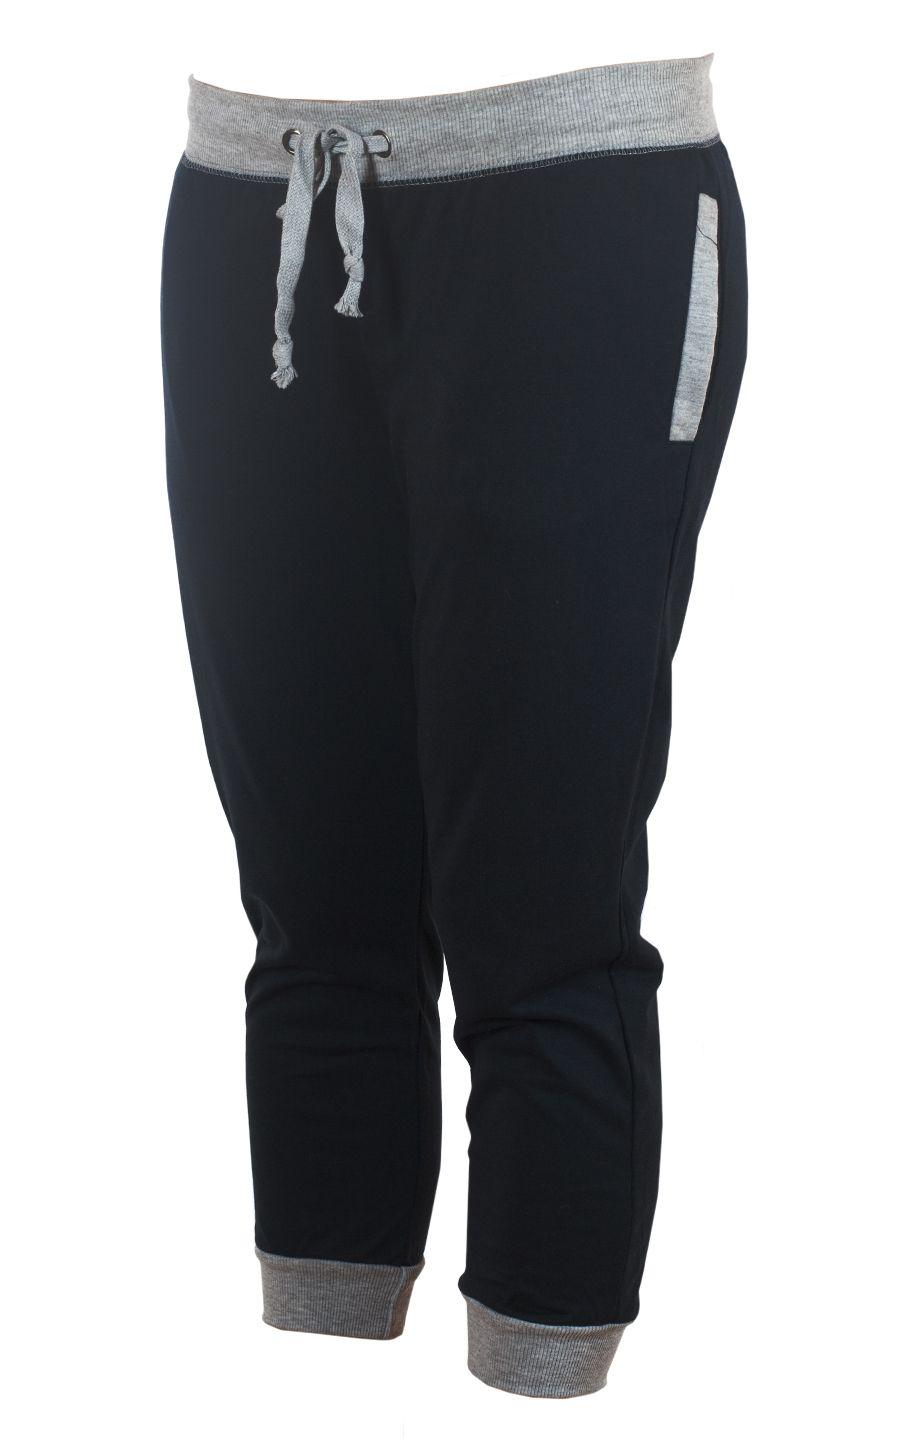 Американские брюки капри Coco Limon для фитнес-тренинга